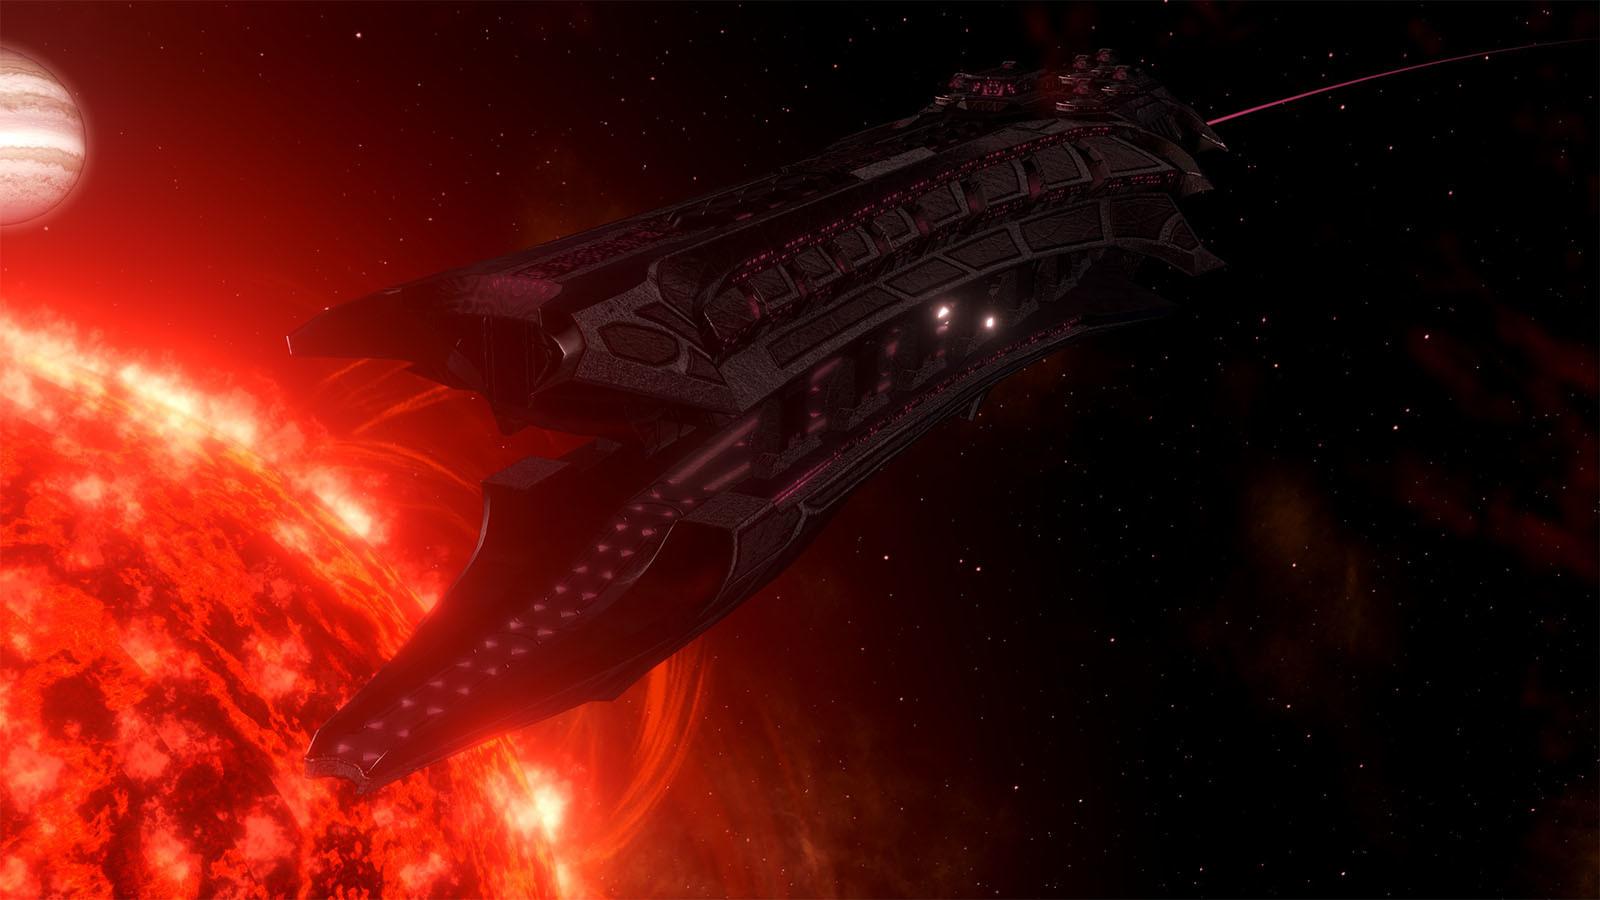 Stellaris: Necroids Species Pack   CN_KR_LATAM_TR (fcfb9581-c119-4cf3-ba60-a3ffefbcb91b)